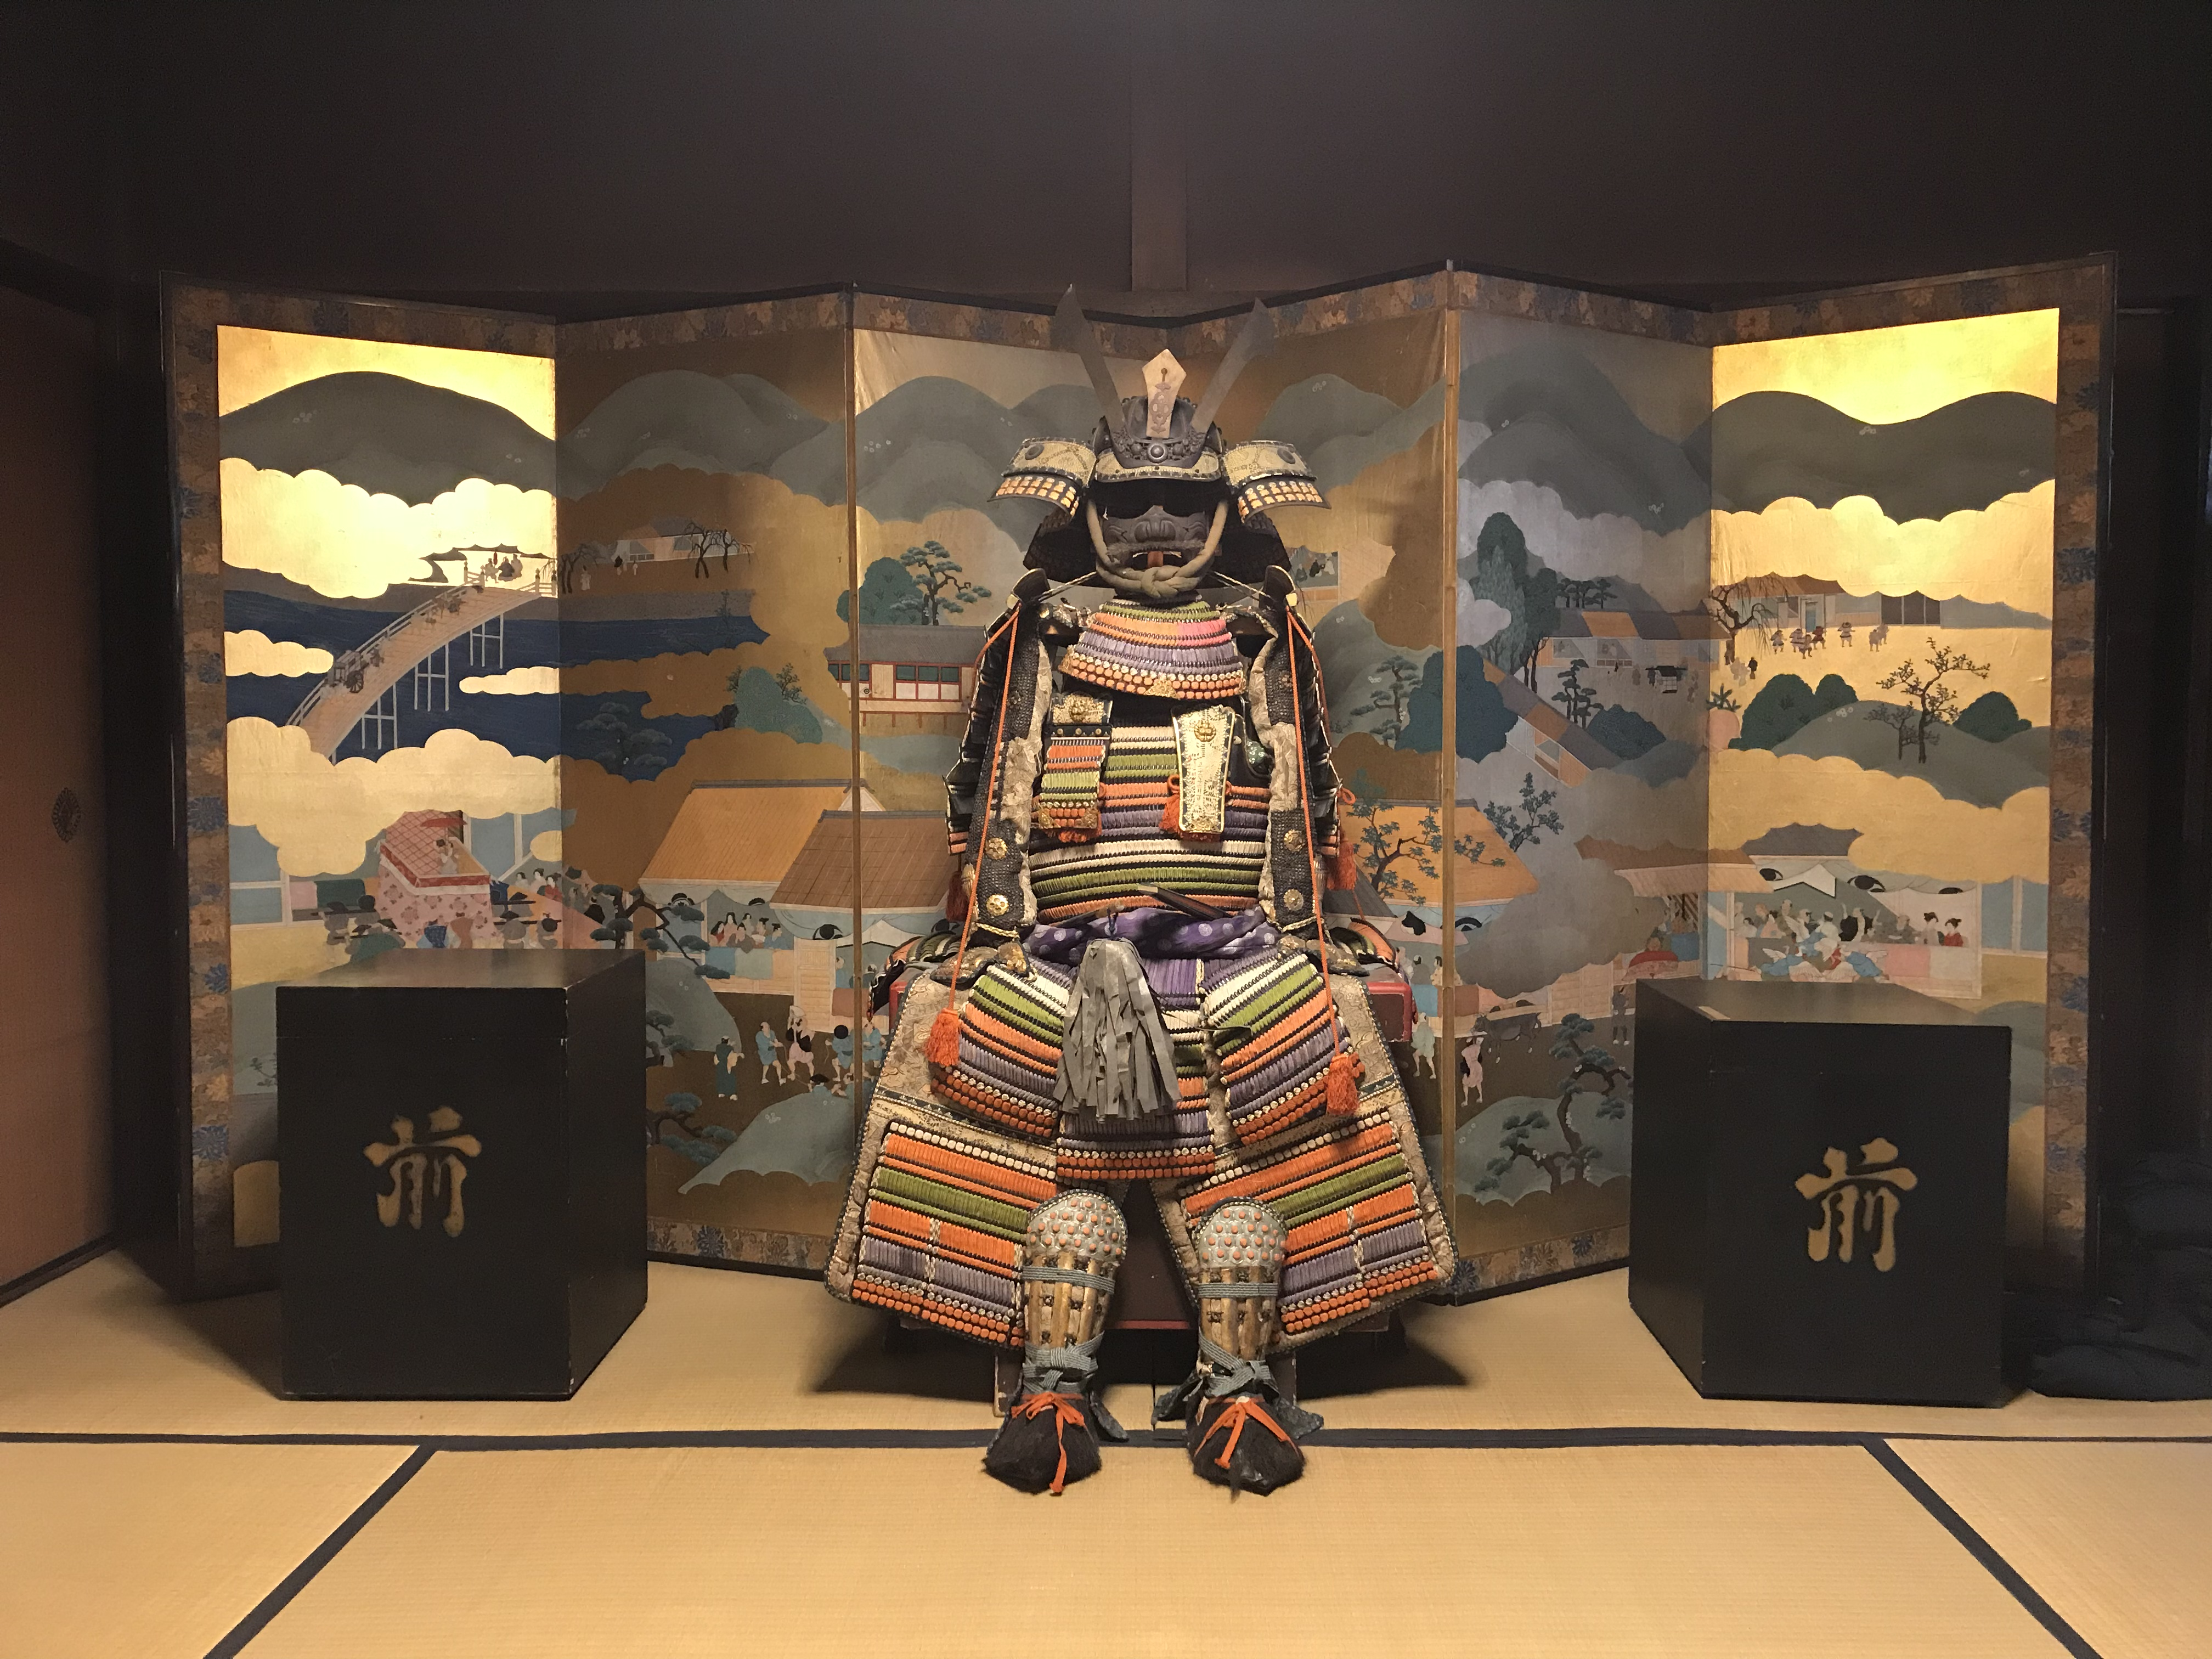 The Cool World of Samurai